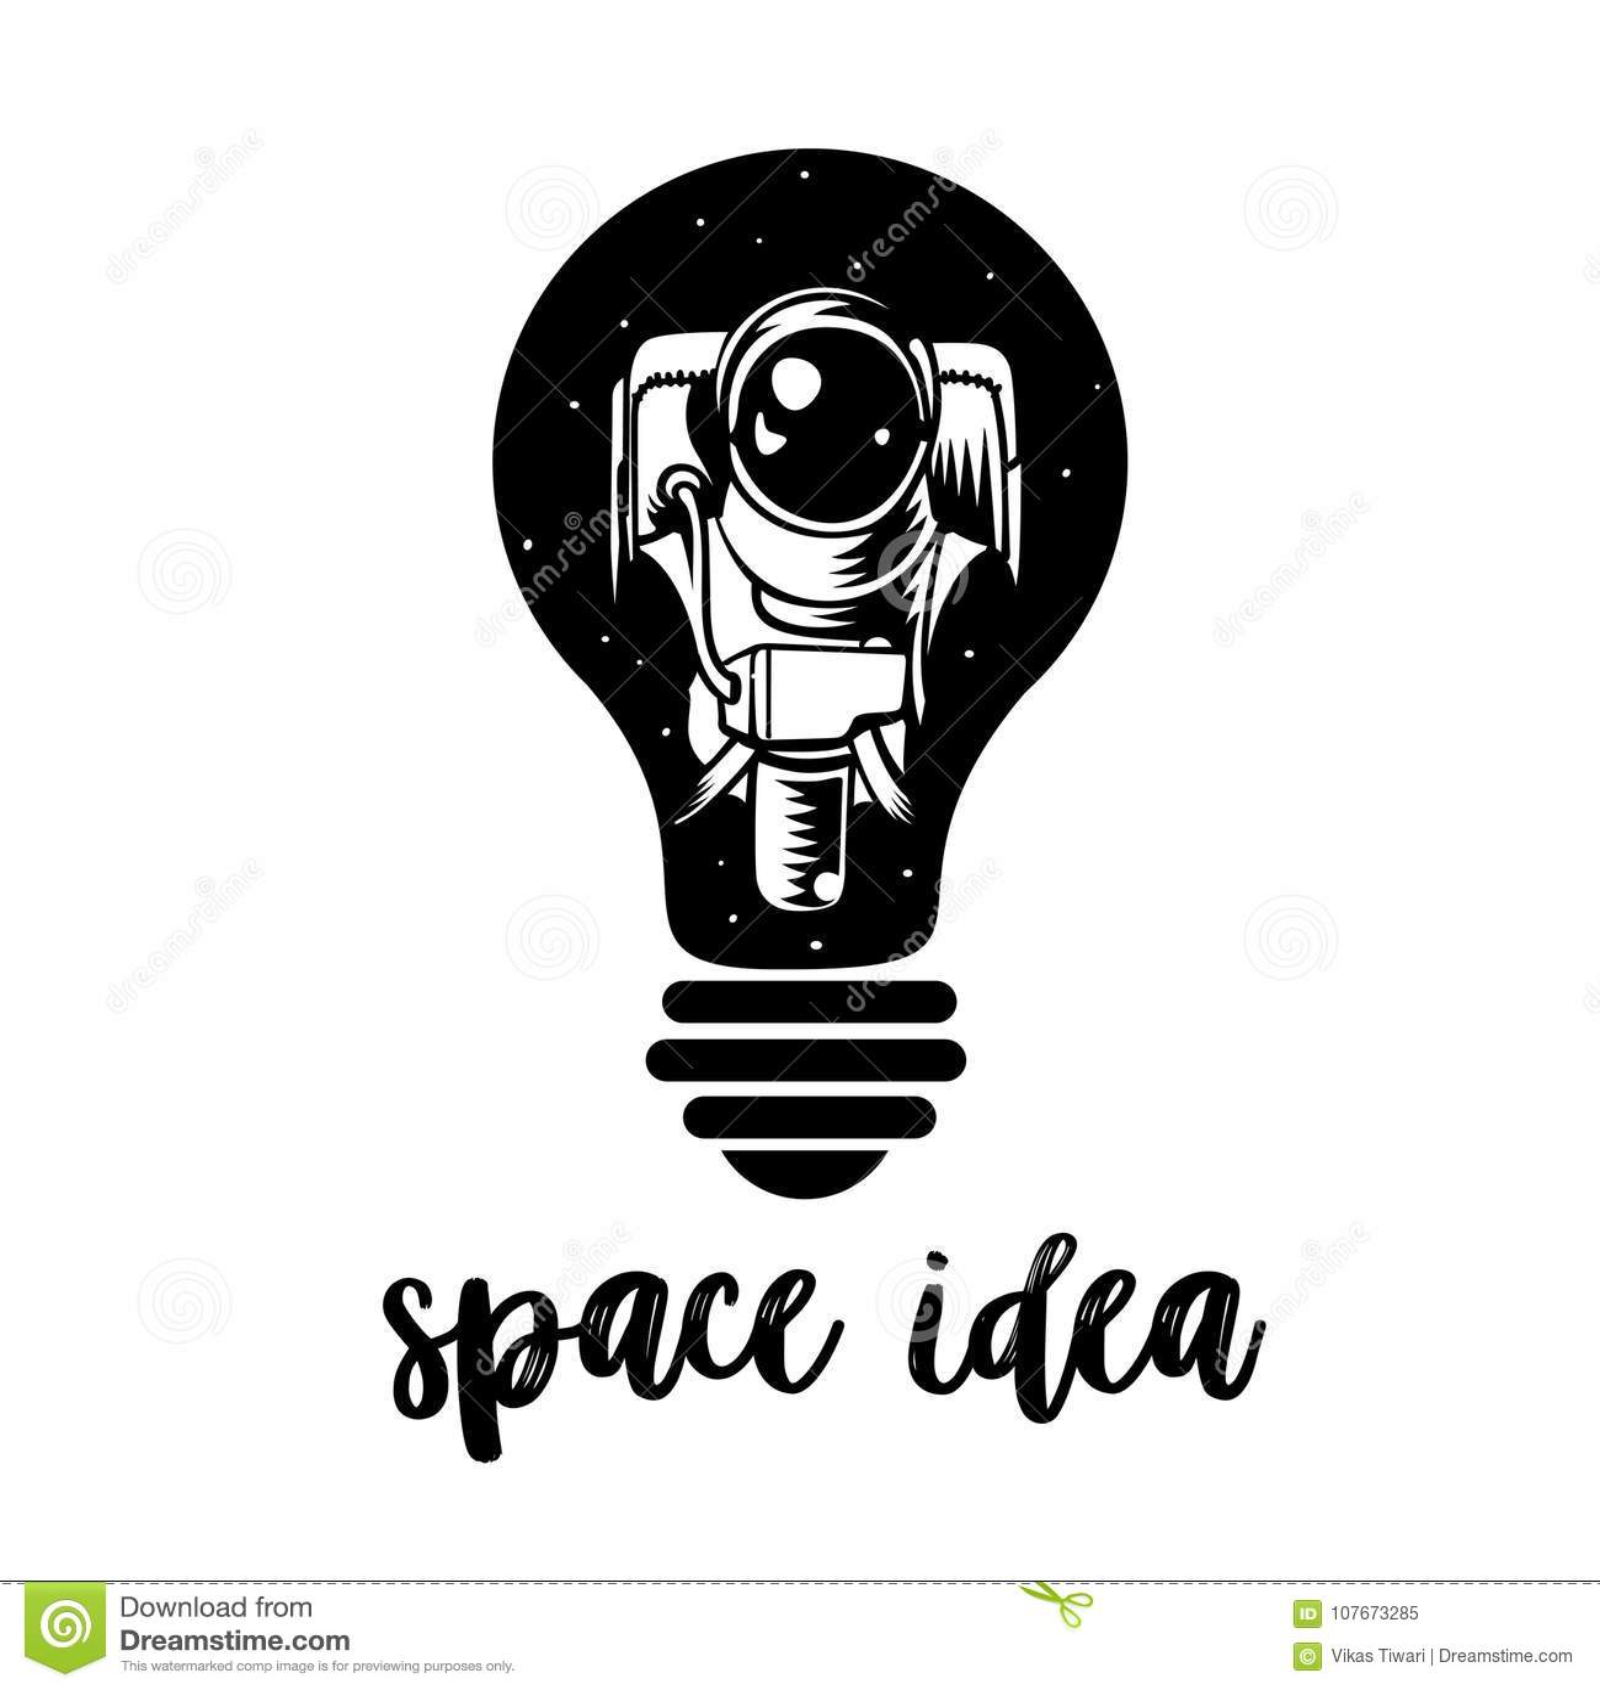 Astronaut in a light bulb symbol of creative thinking new ideas astronaut in a light bulb symbol of creative thinking new ideas biocorpaavc